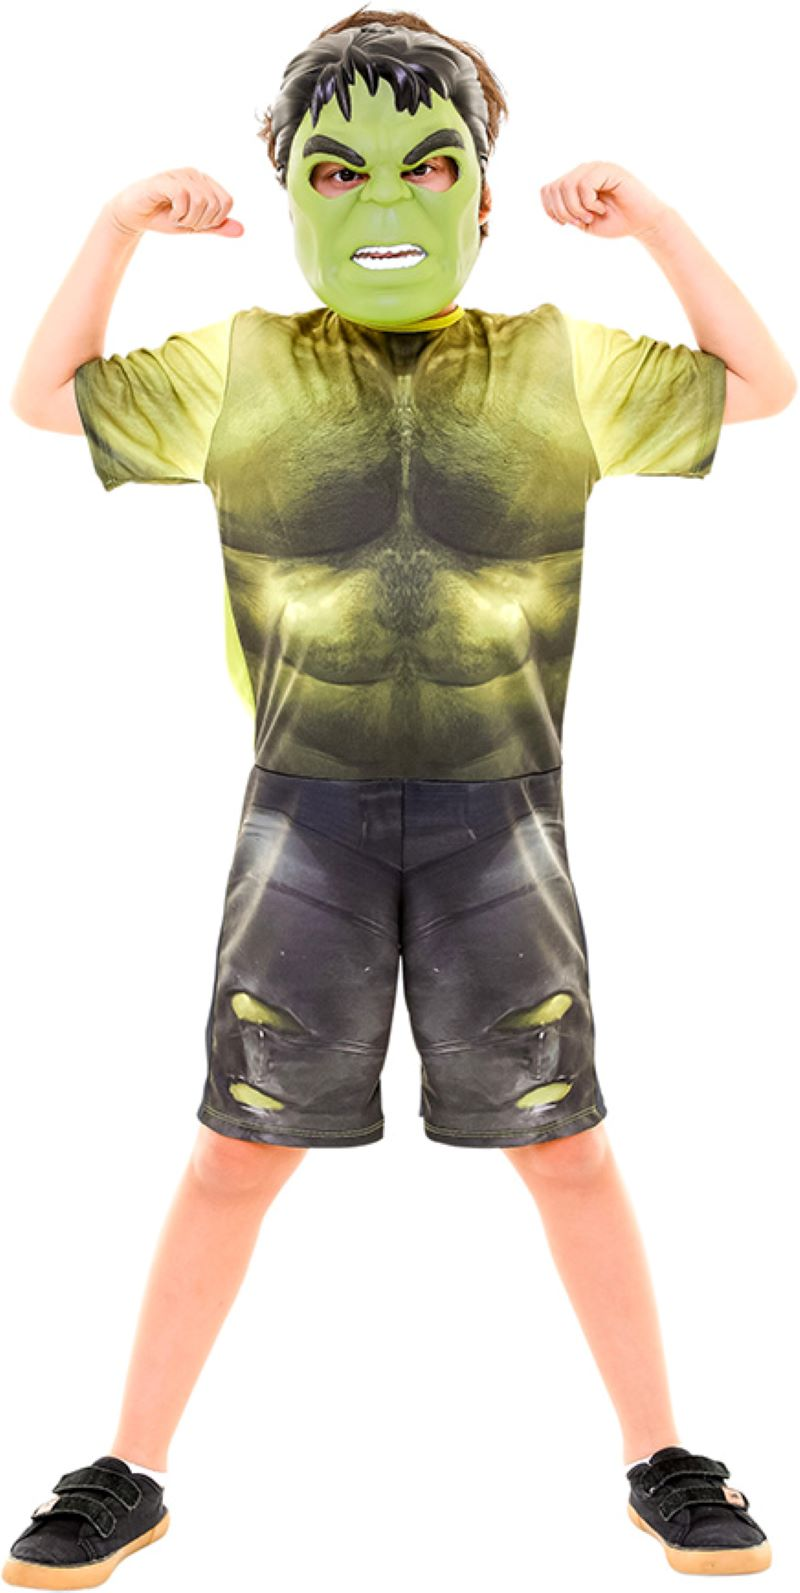 Fantasia Hulk Curta Infantil Filme Guerra Infinita Original